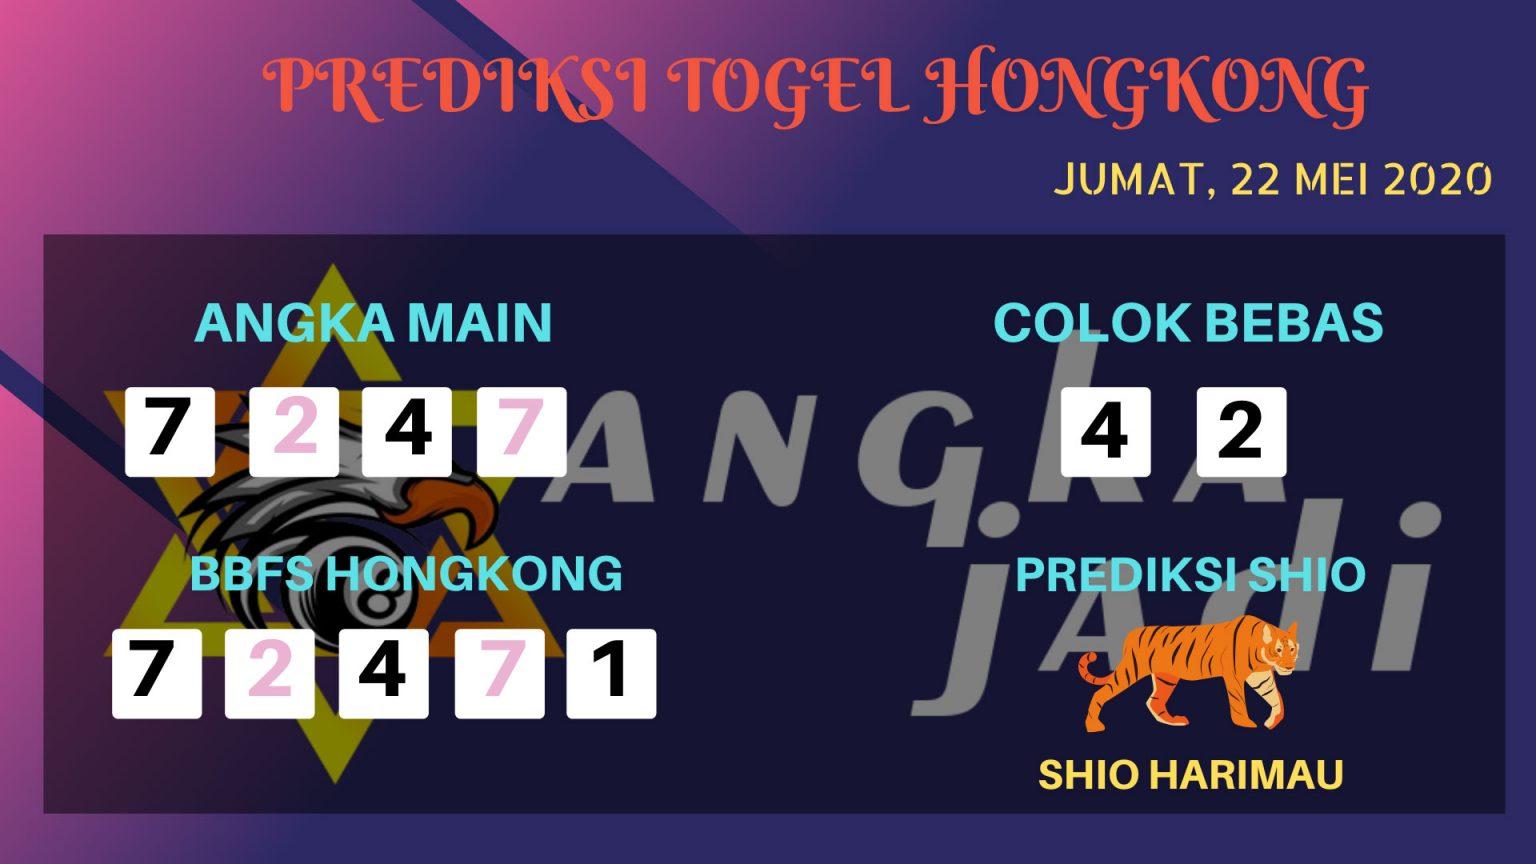 Prediksi HK Jumat 22 Mei 2020 - Bocoran HK